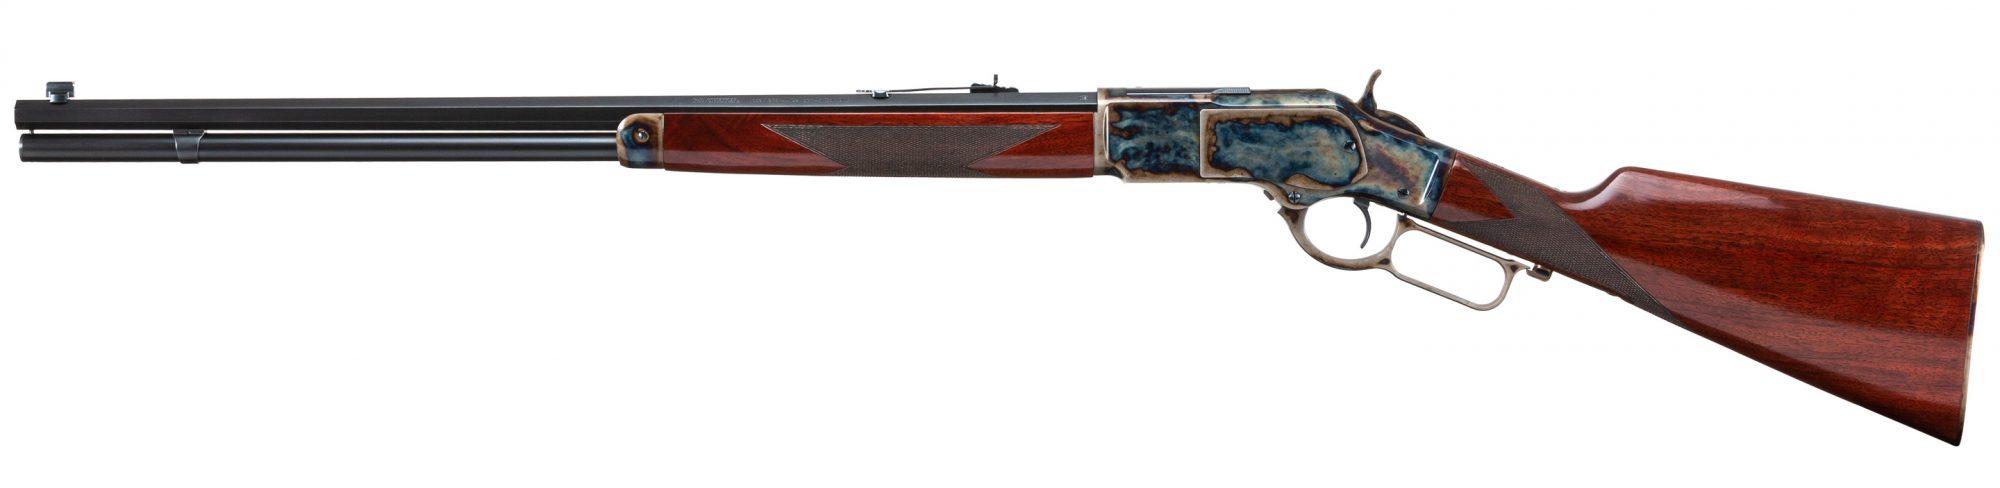 6277 Turnbull Winchester 1873 45 Colt 00057ZT73W